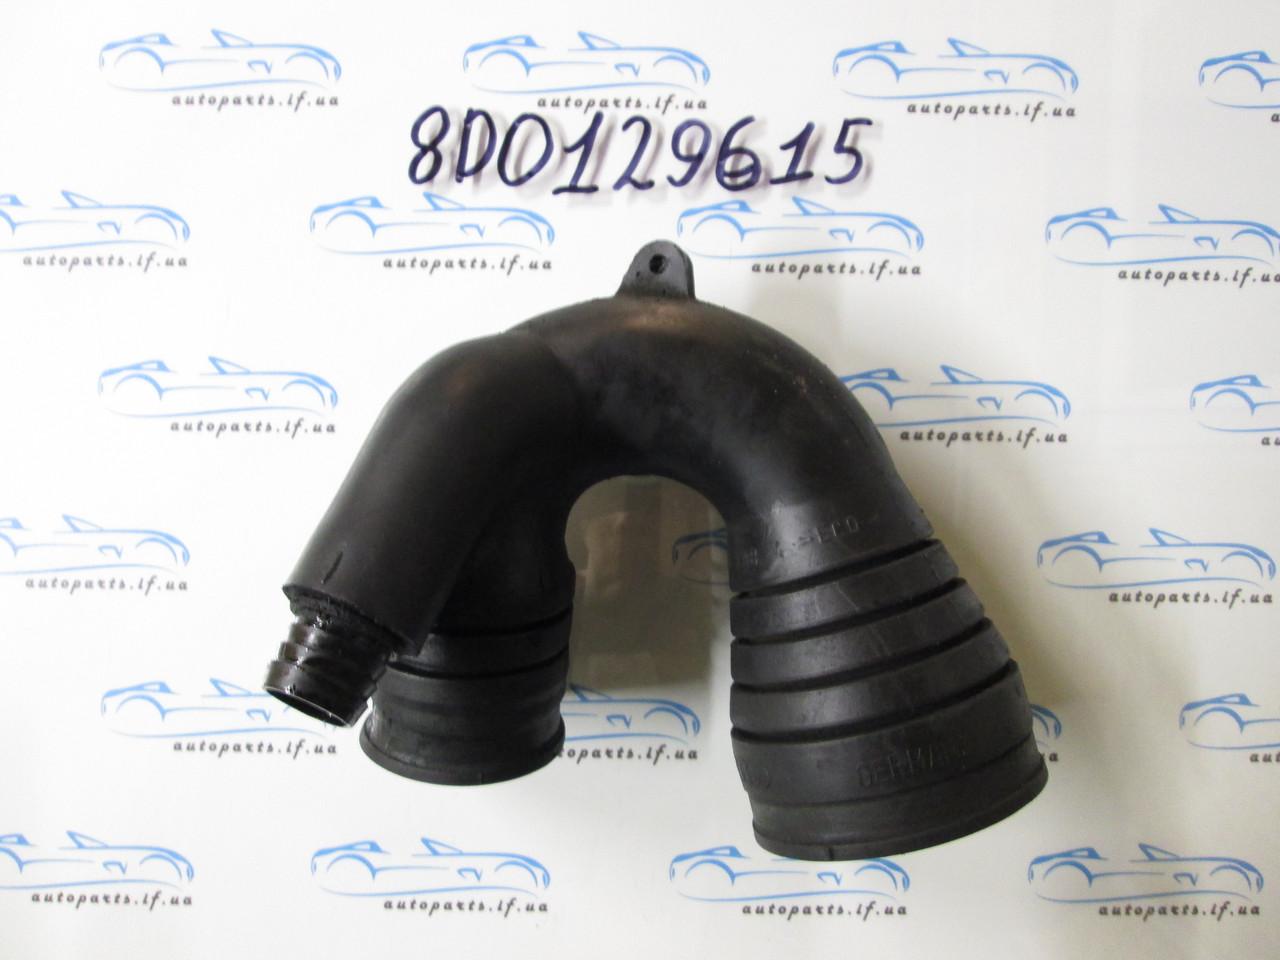 Патрубок интеркуллера VAG 8D0129615